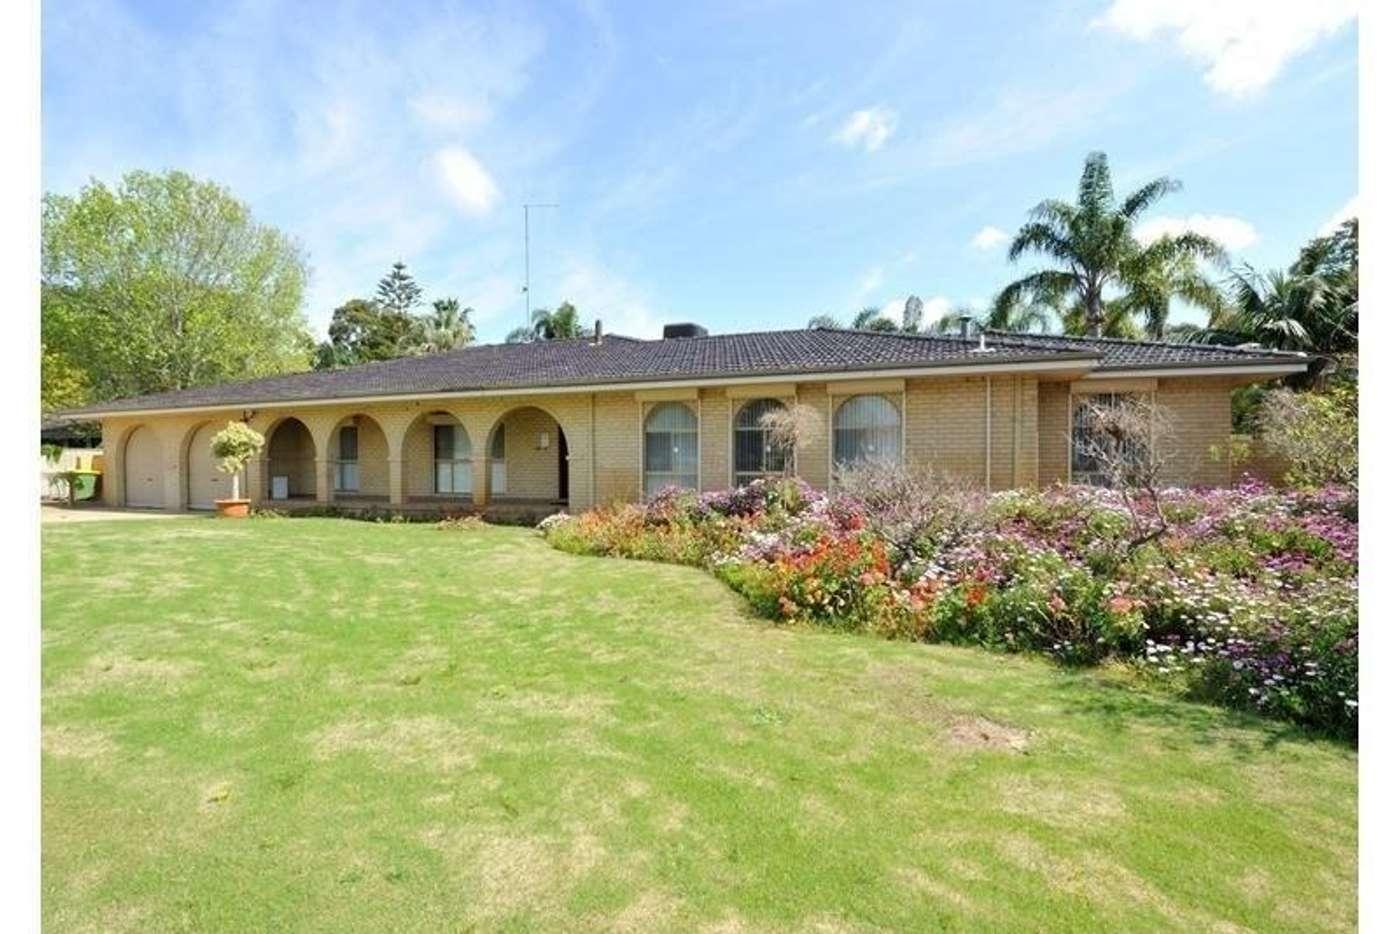 Main view of Homely house listing, 2324 Mandurah Road, Golden Bay WA 6174